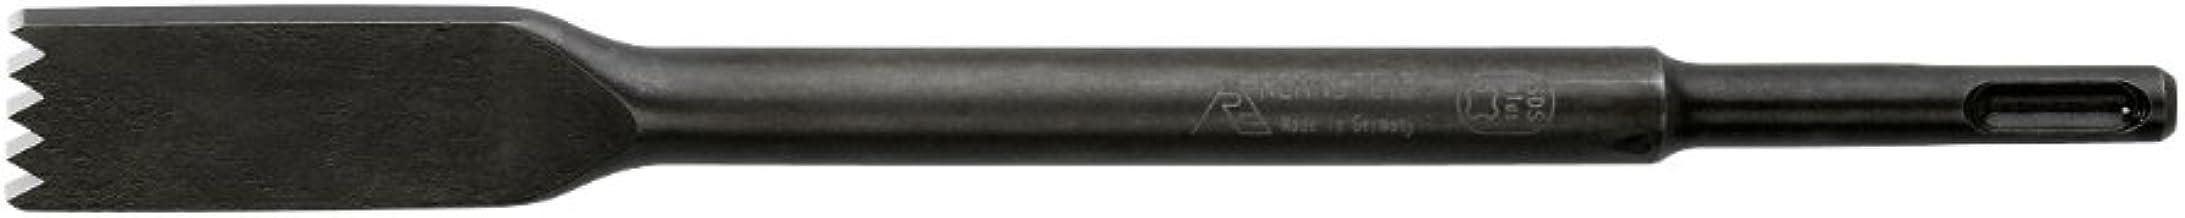 Scalpello per piastrelle SDS-Plus 250 mm Rennsteig 419 250